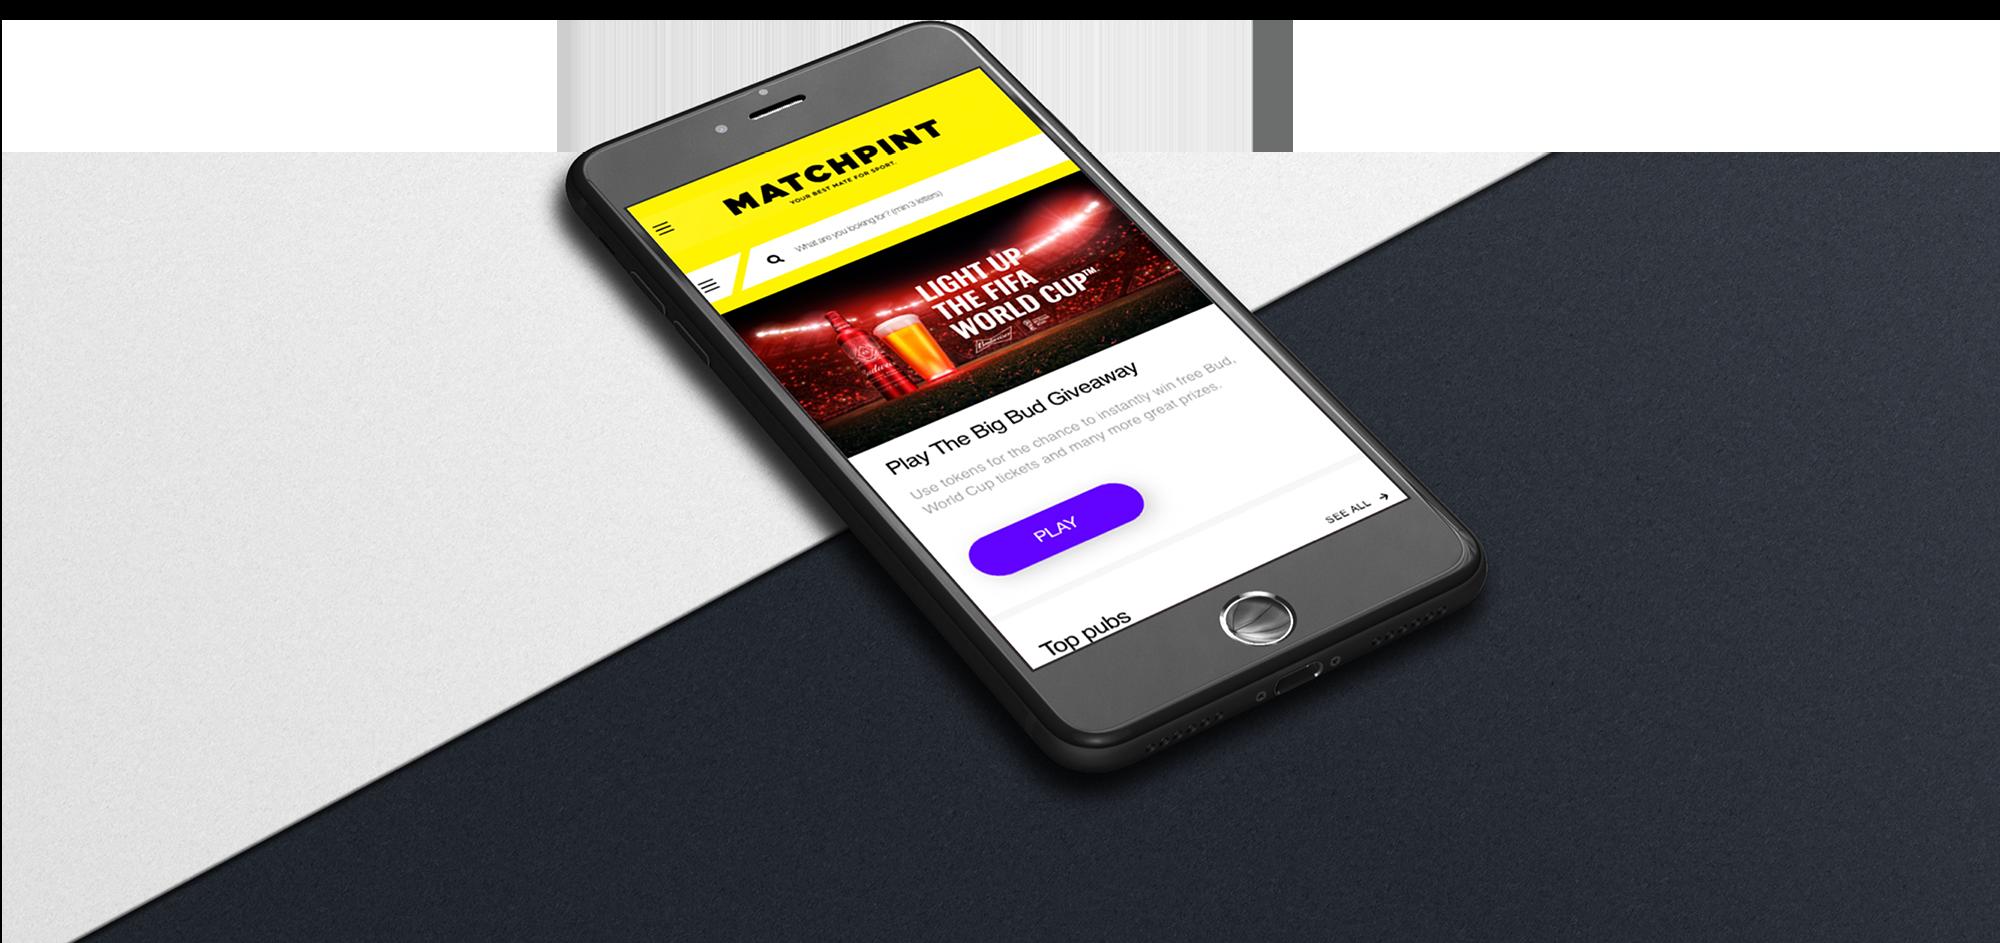 Matchpint mobile screen